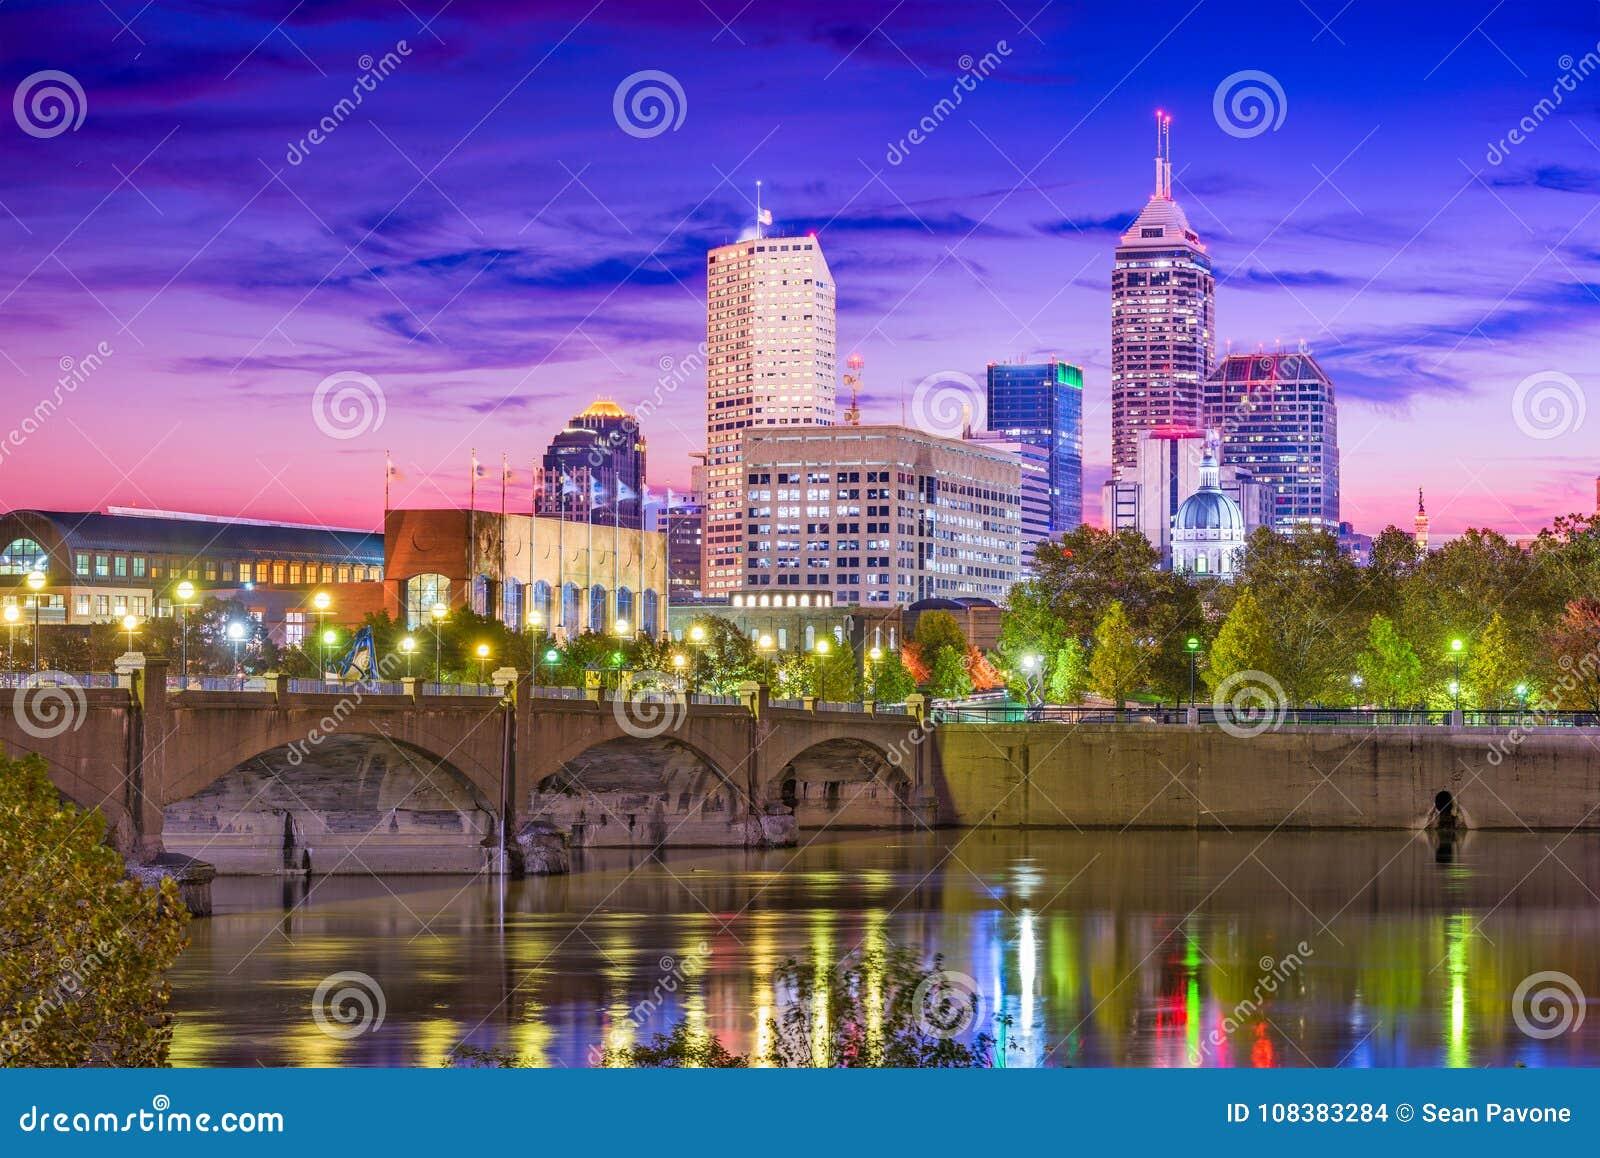 Indianapolis Indiana, USA